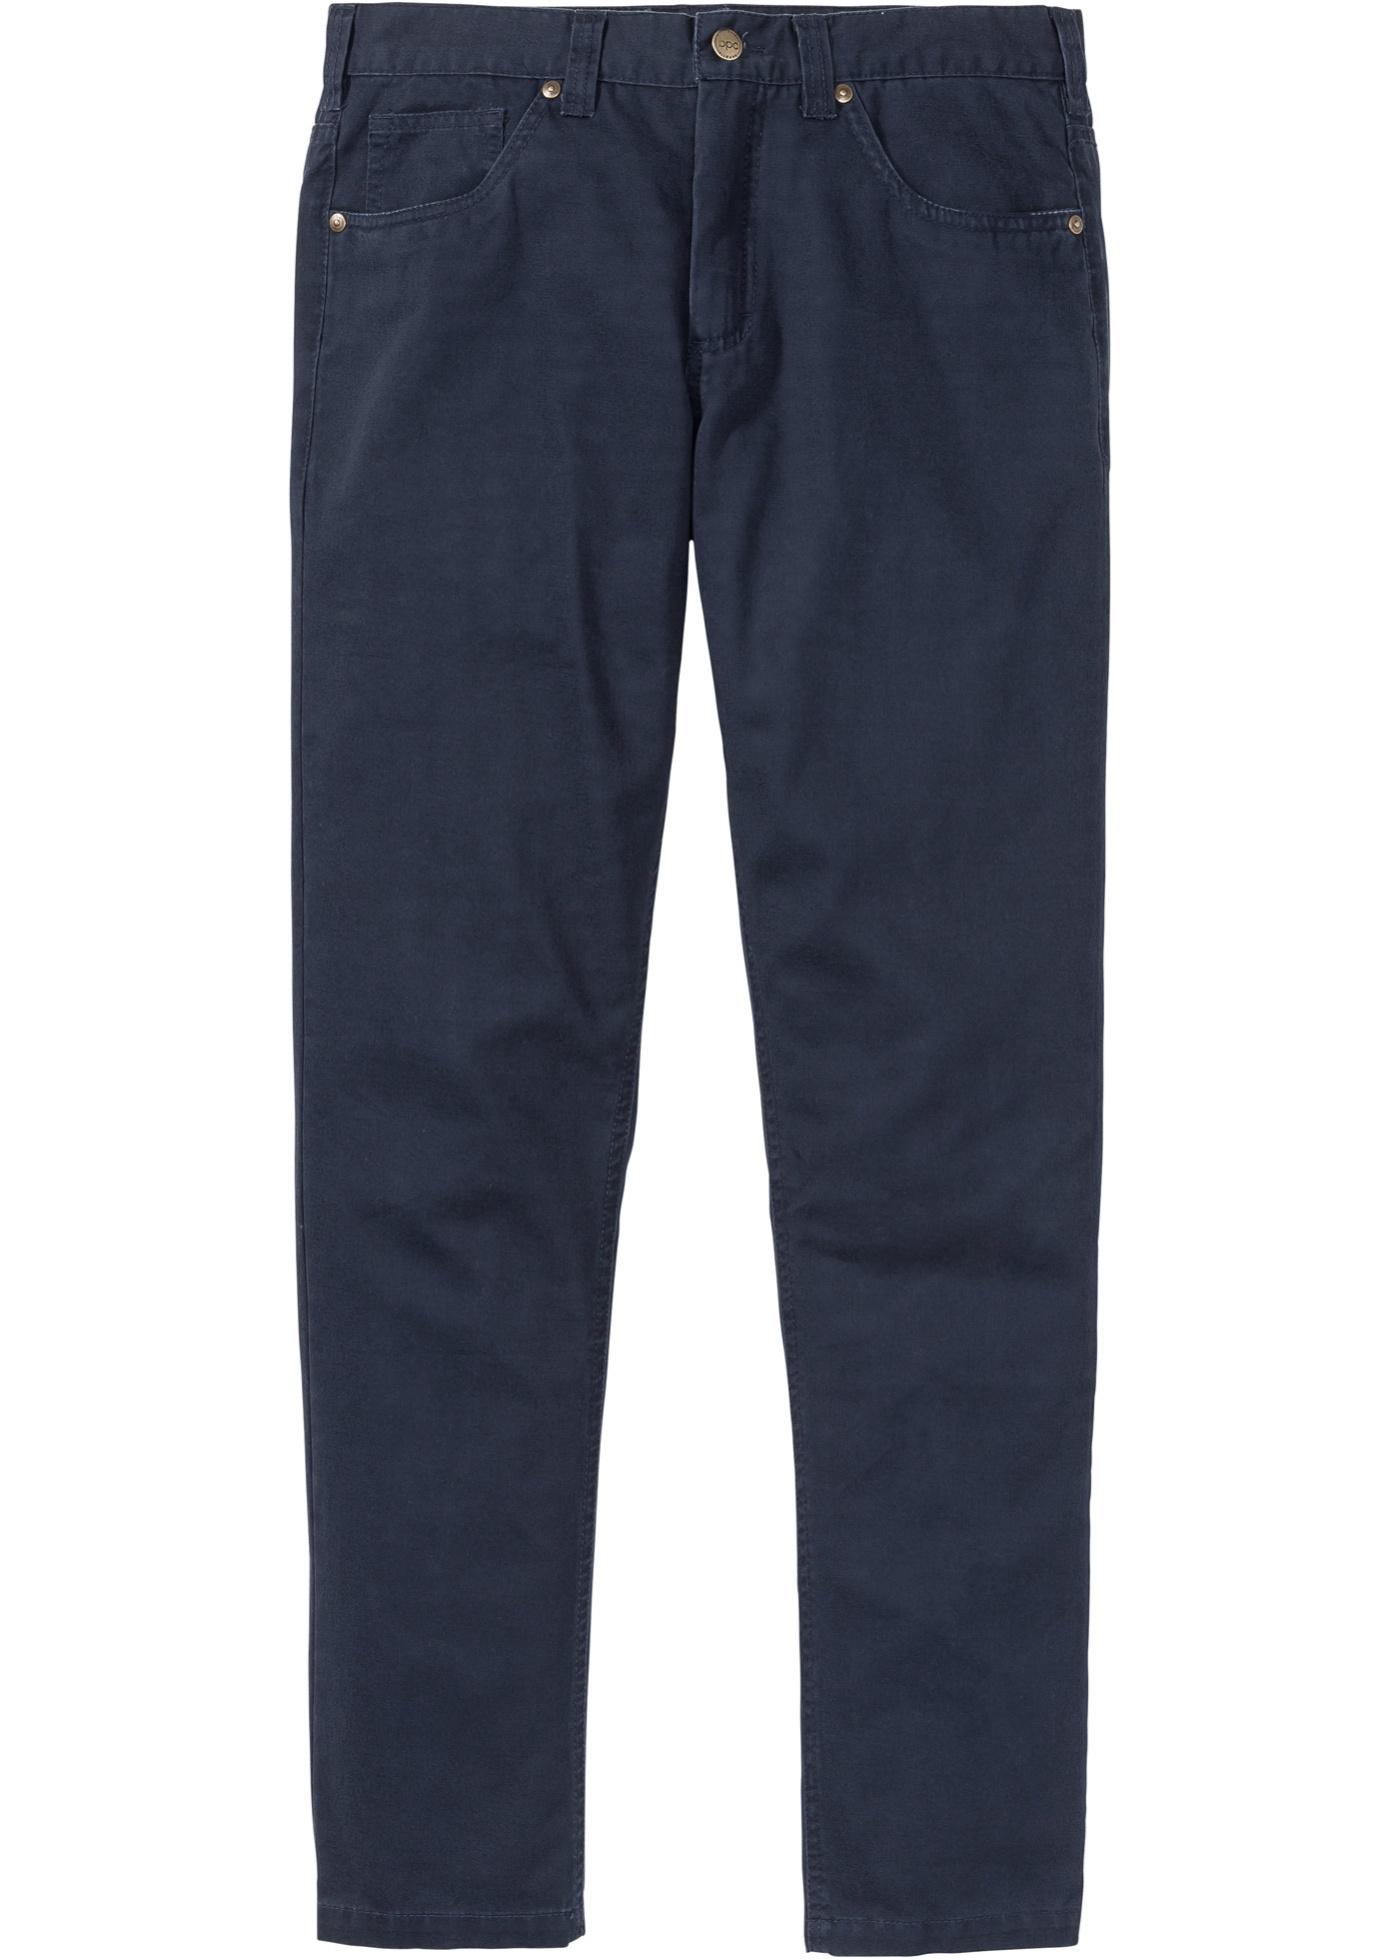 Pantalone 5 tasche regula